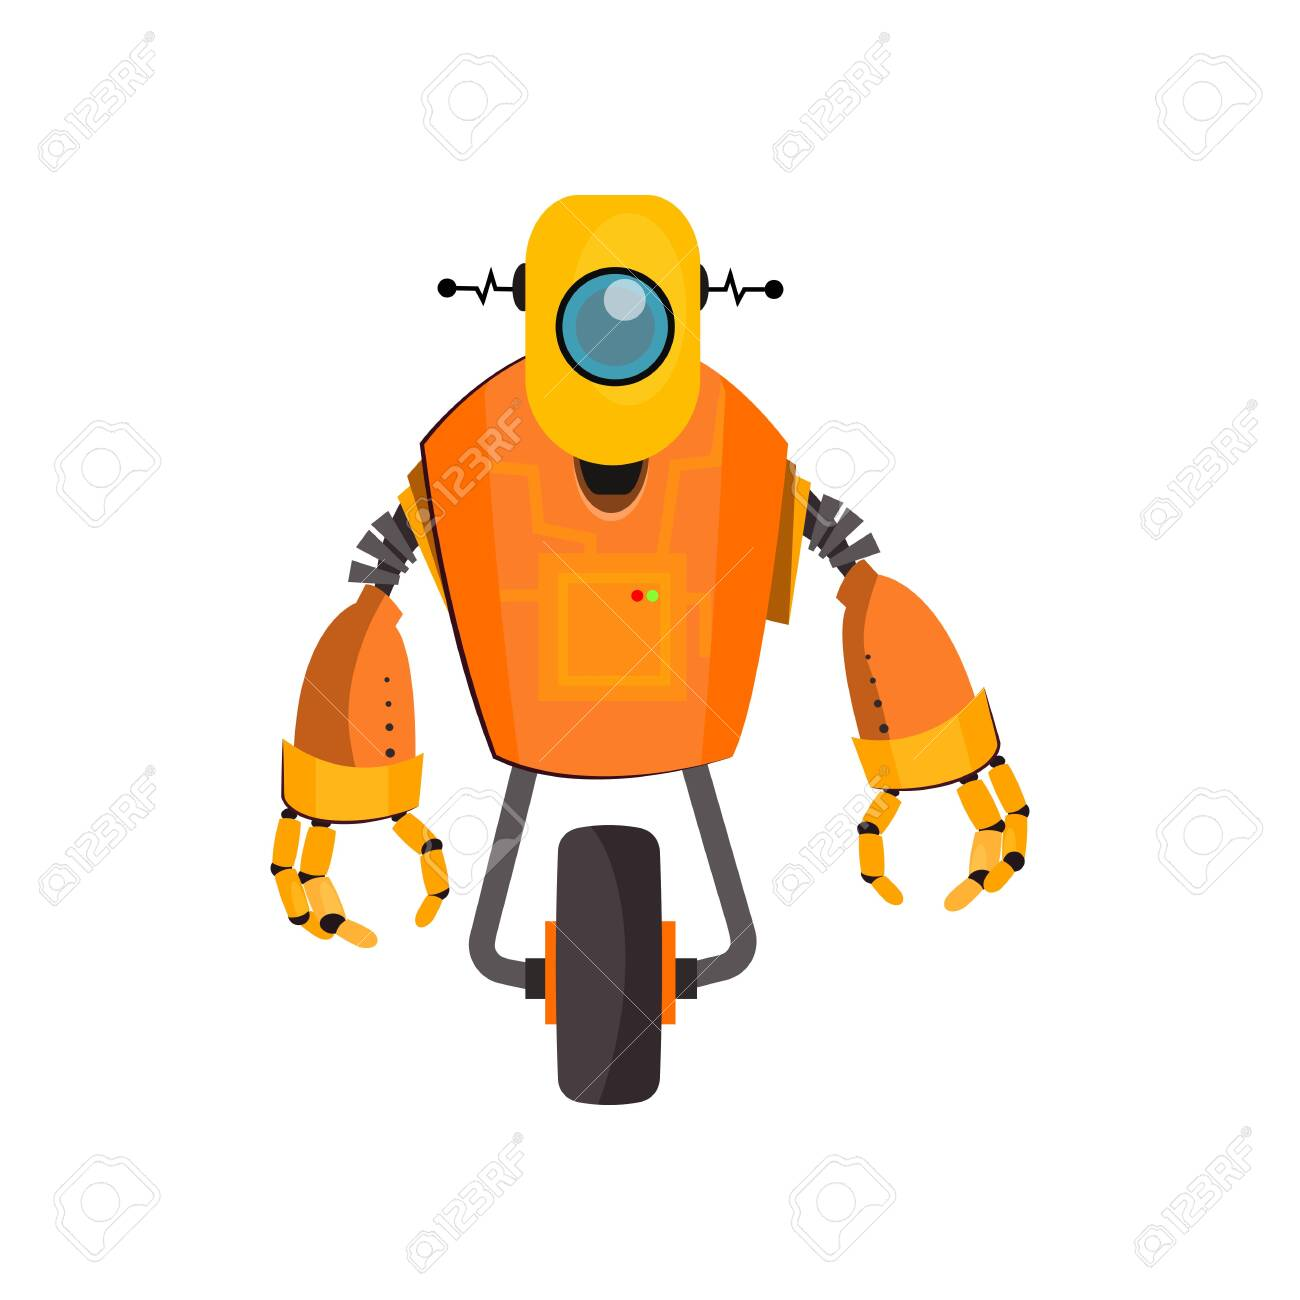 Yellow robot cartoon illustration  One wheeled cyborg with wheel